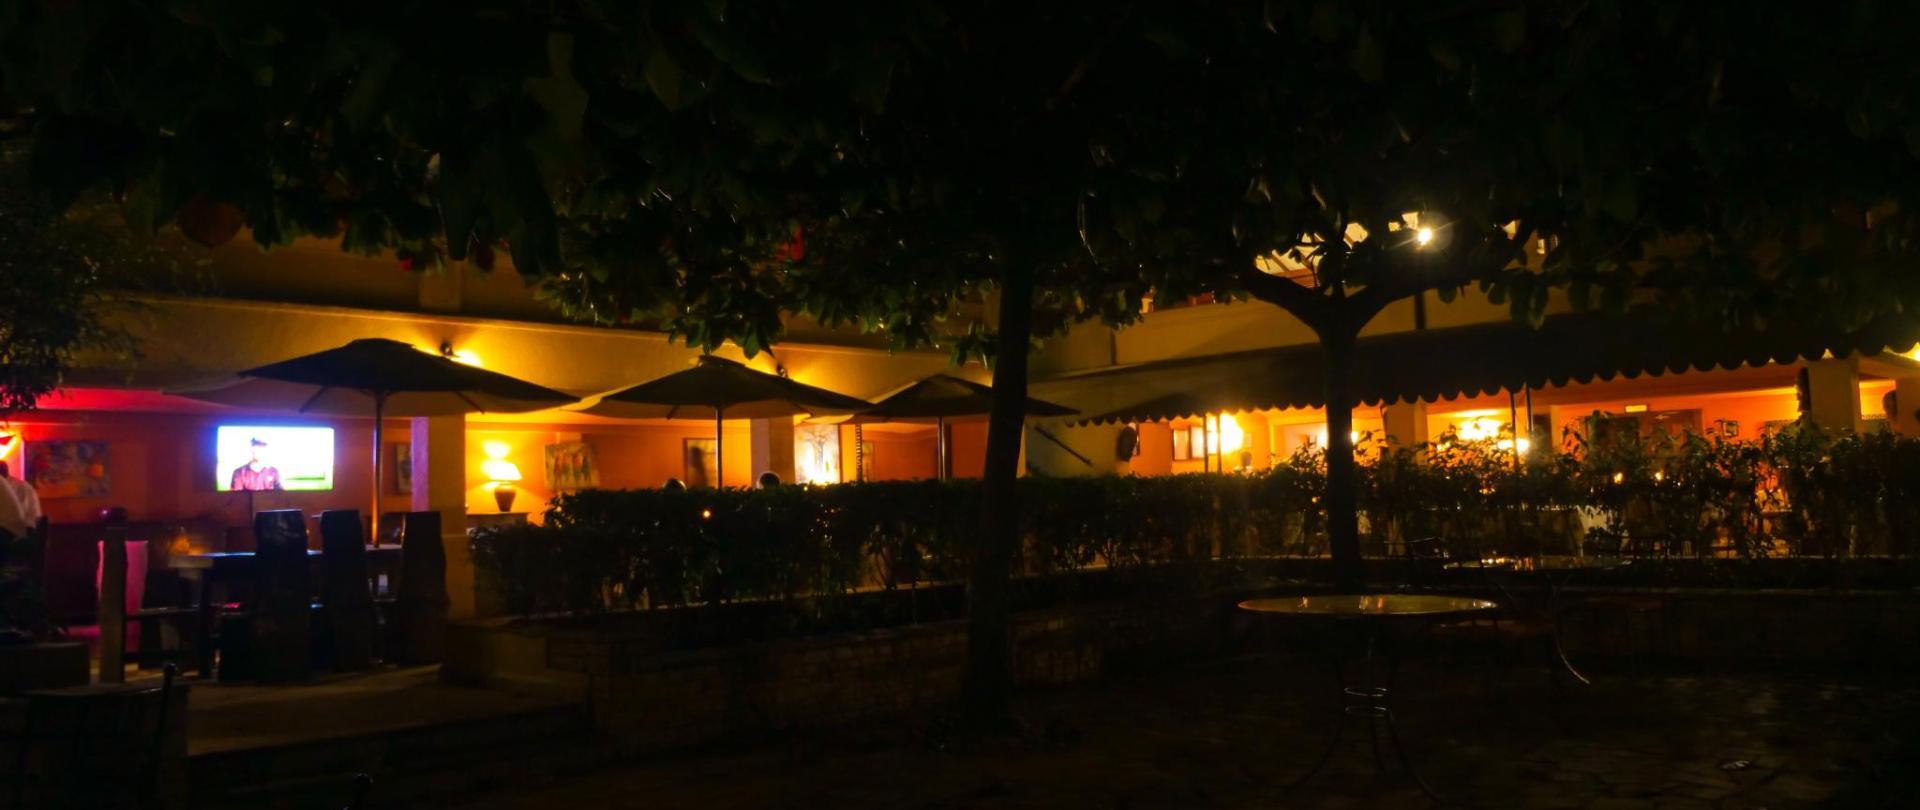 The Emin Pasha Hotel